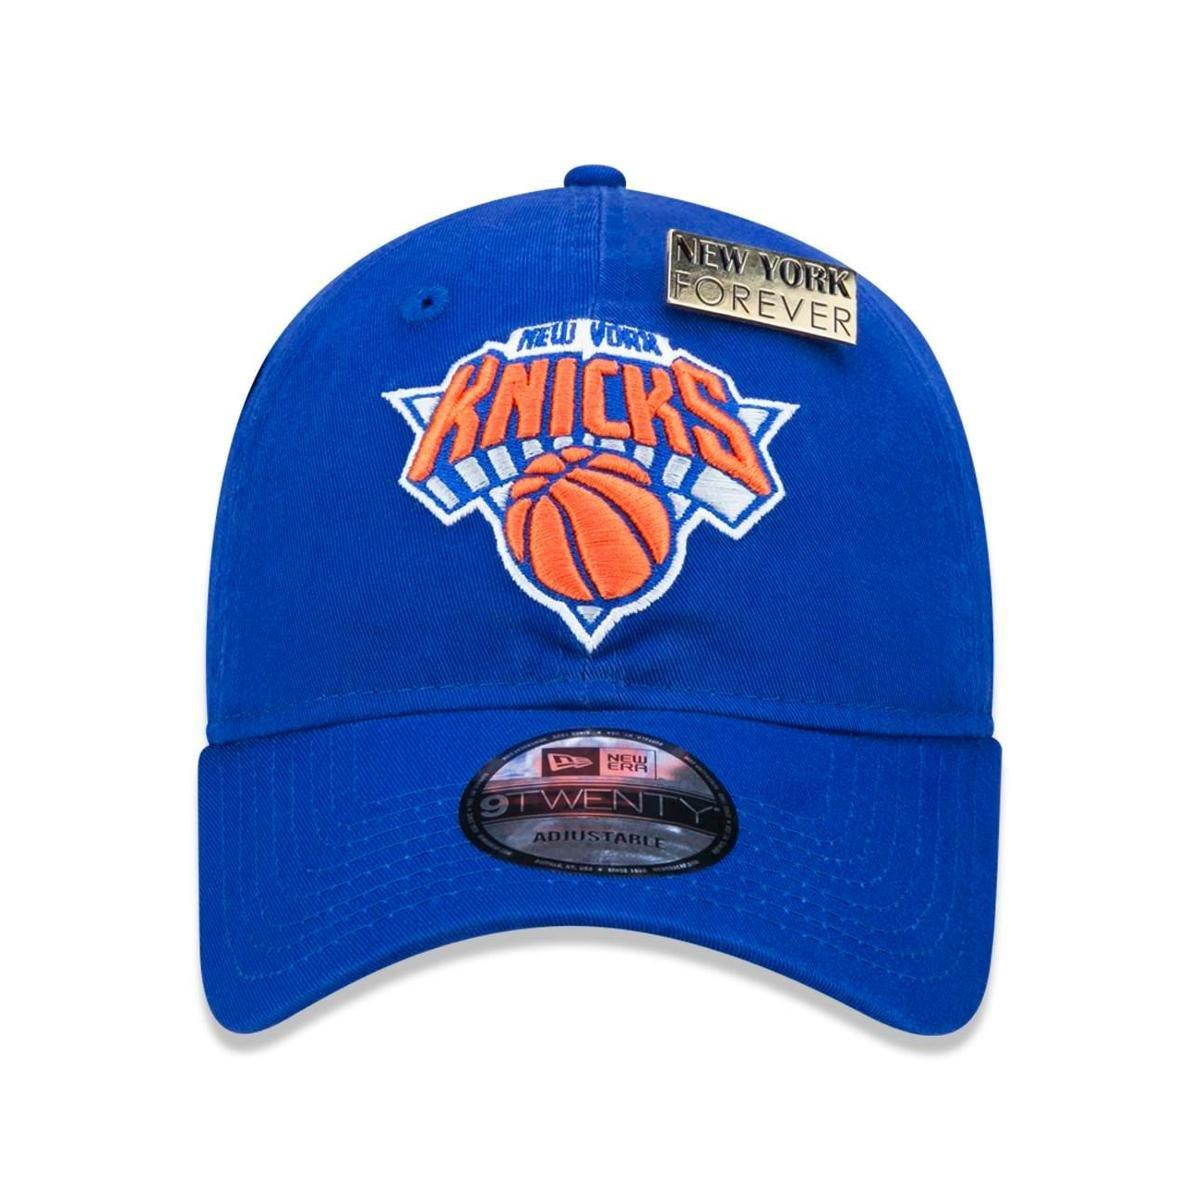 Boné 920 New York Knicks NBA Aba Curva New Era - Compre Agora  ca95b160910